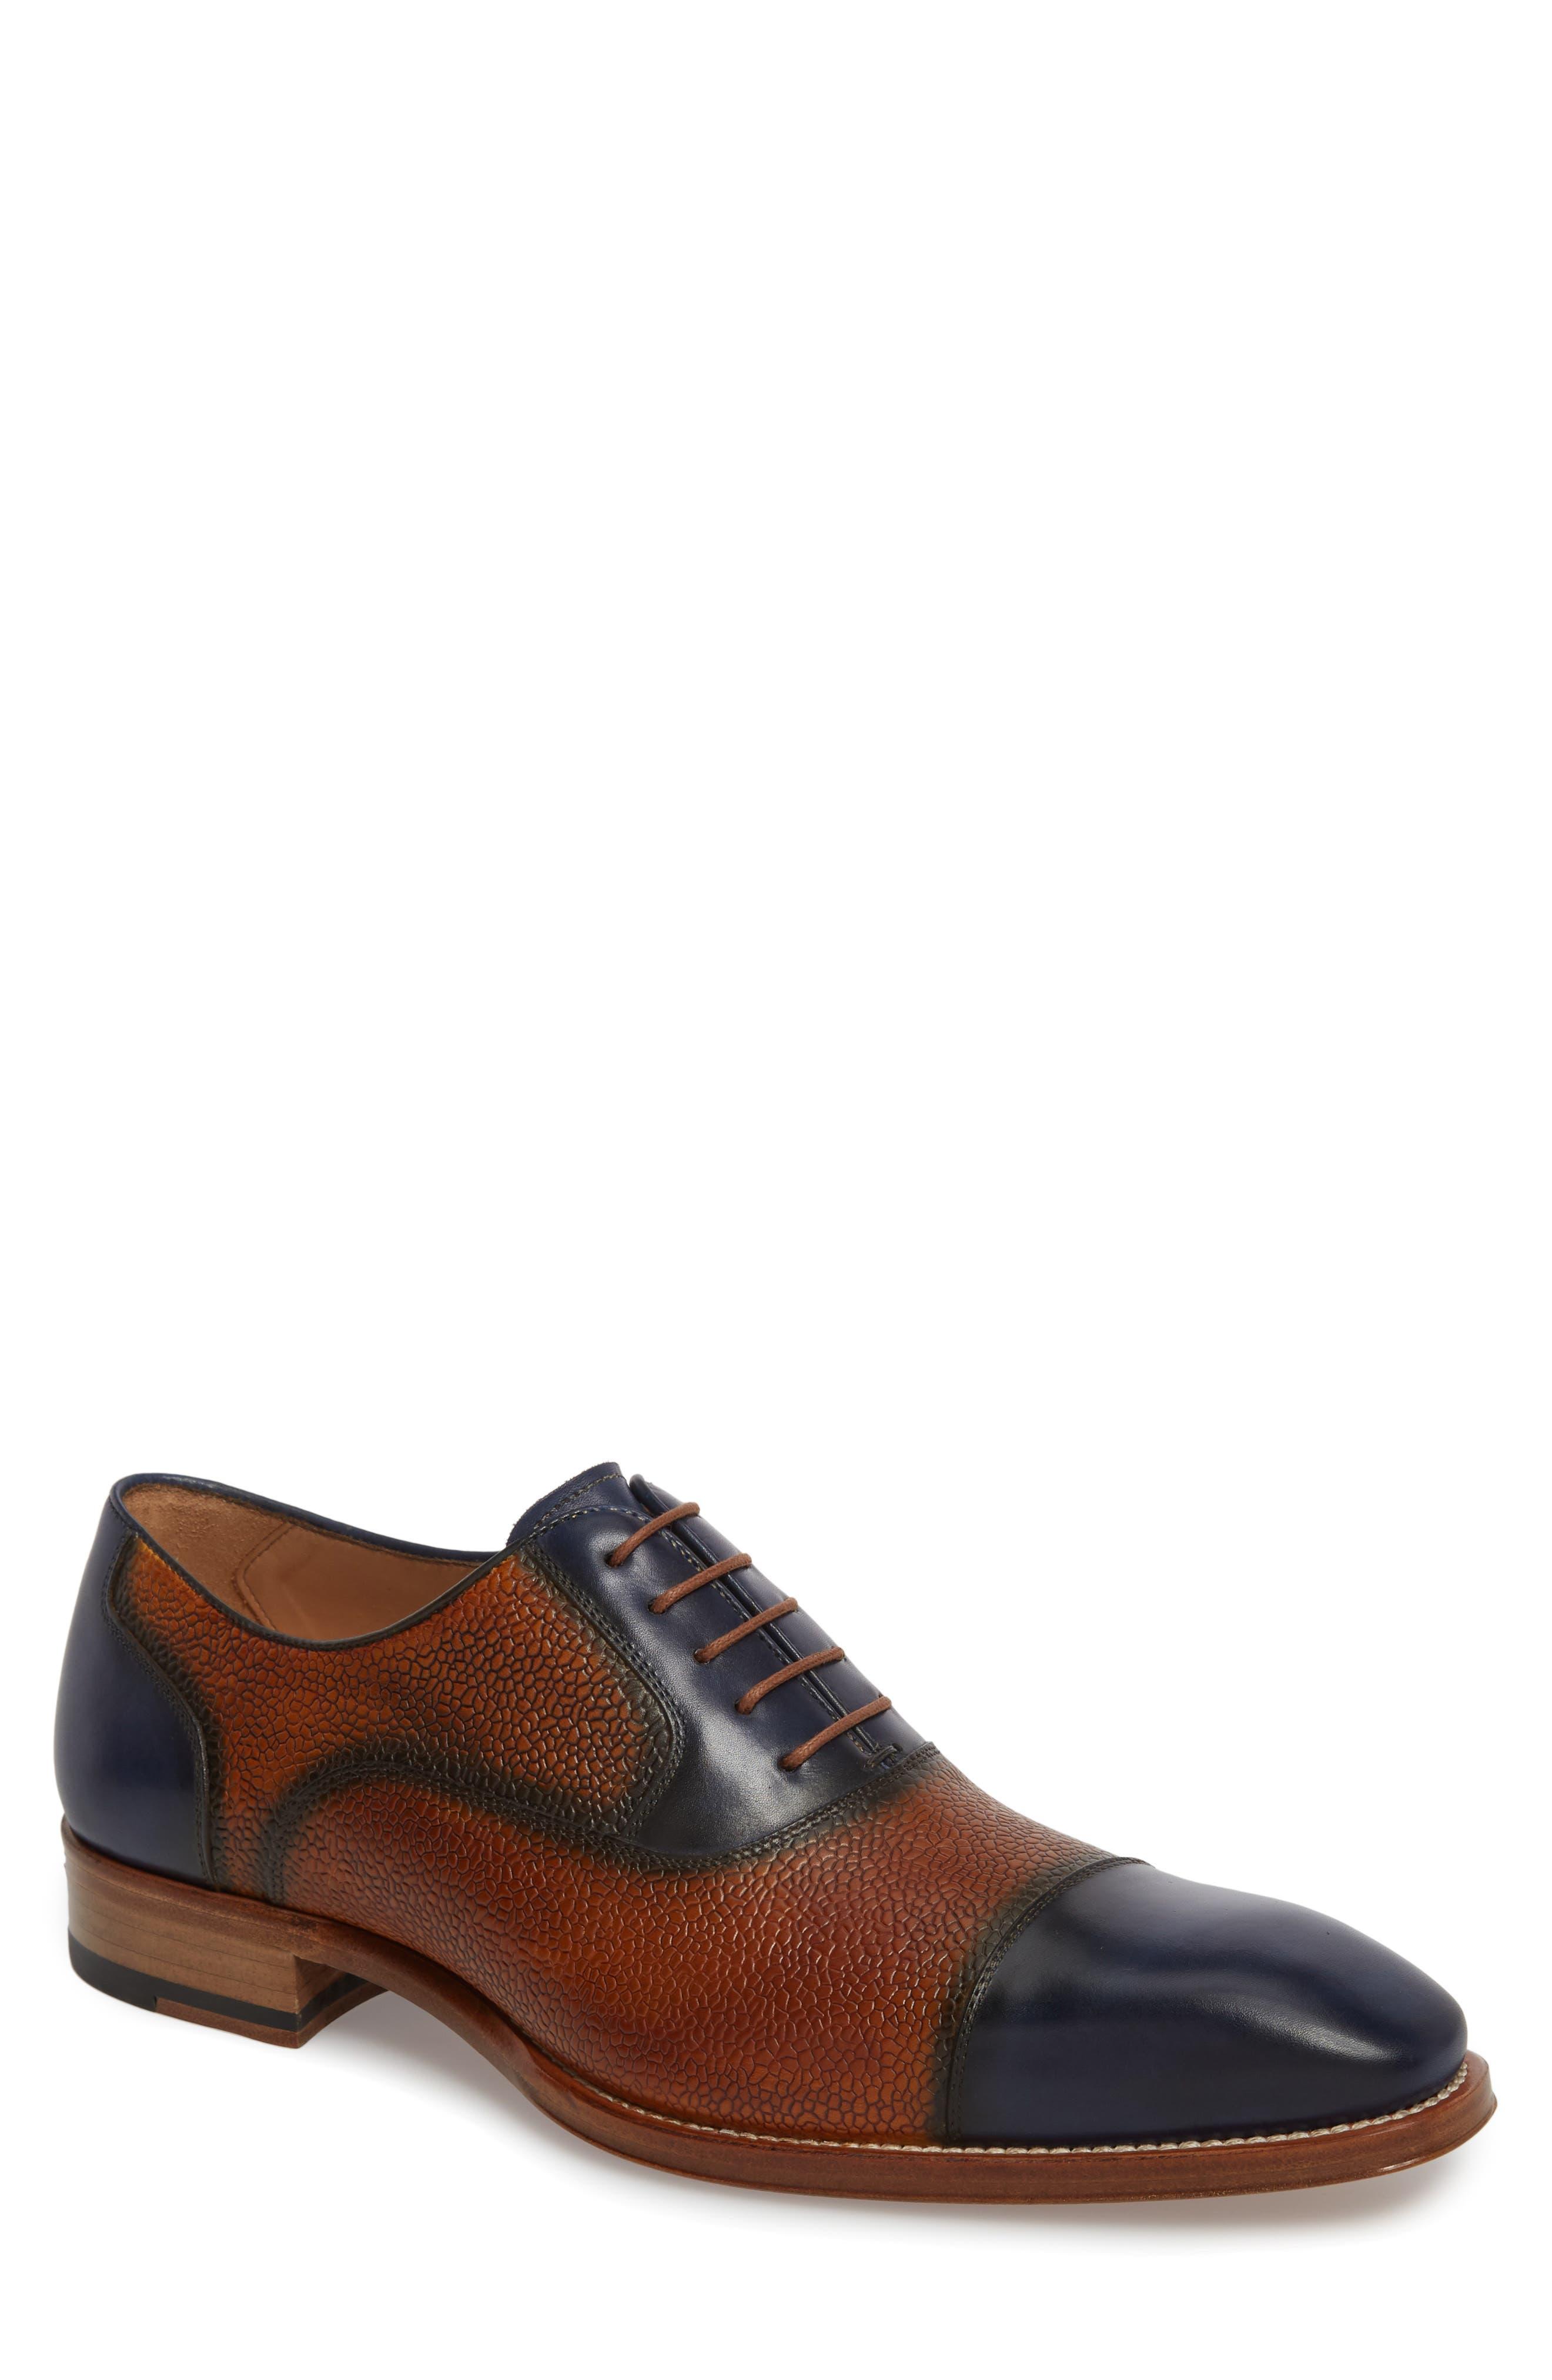 Verino Cap Toe Oxford,                         Main,                         color, Blue/ Tan Leather